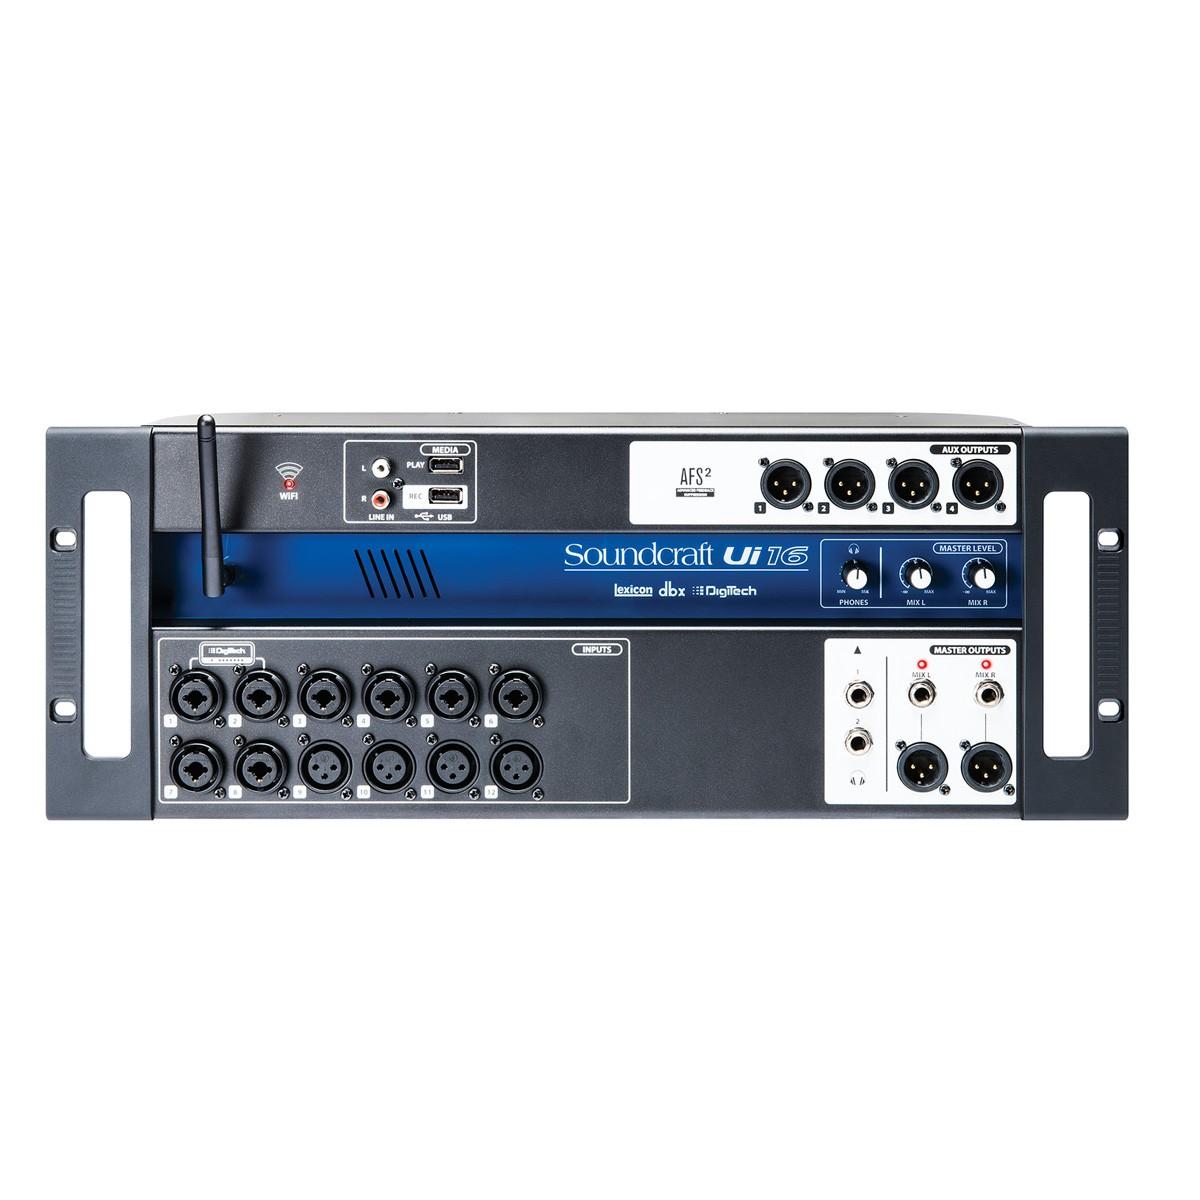 Mesa digita 16 in 4 out  Wifi USB Soundcraft UI16R